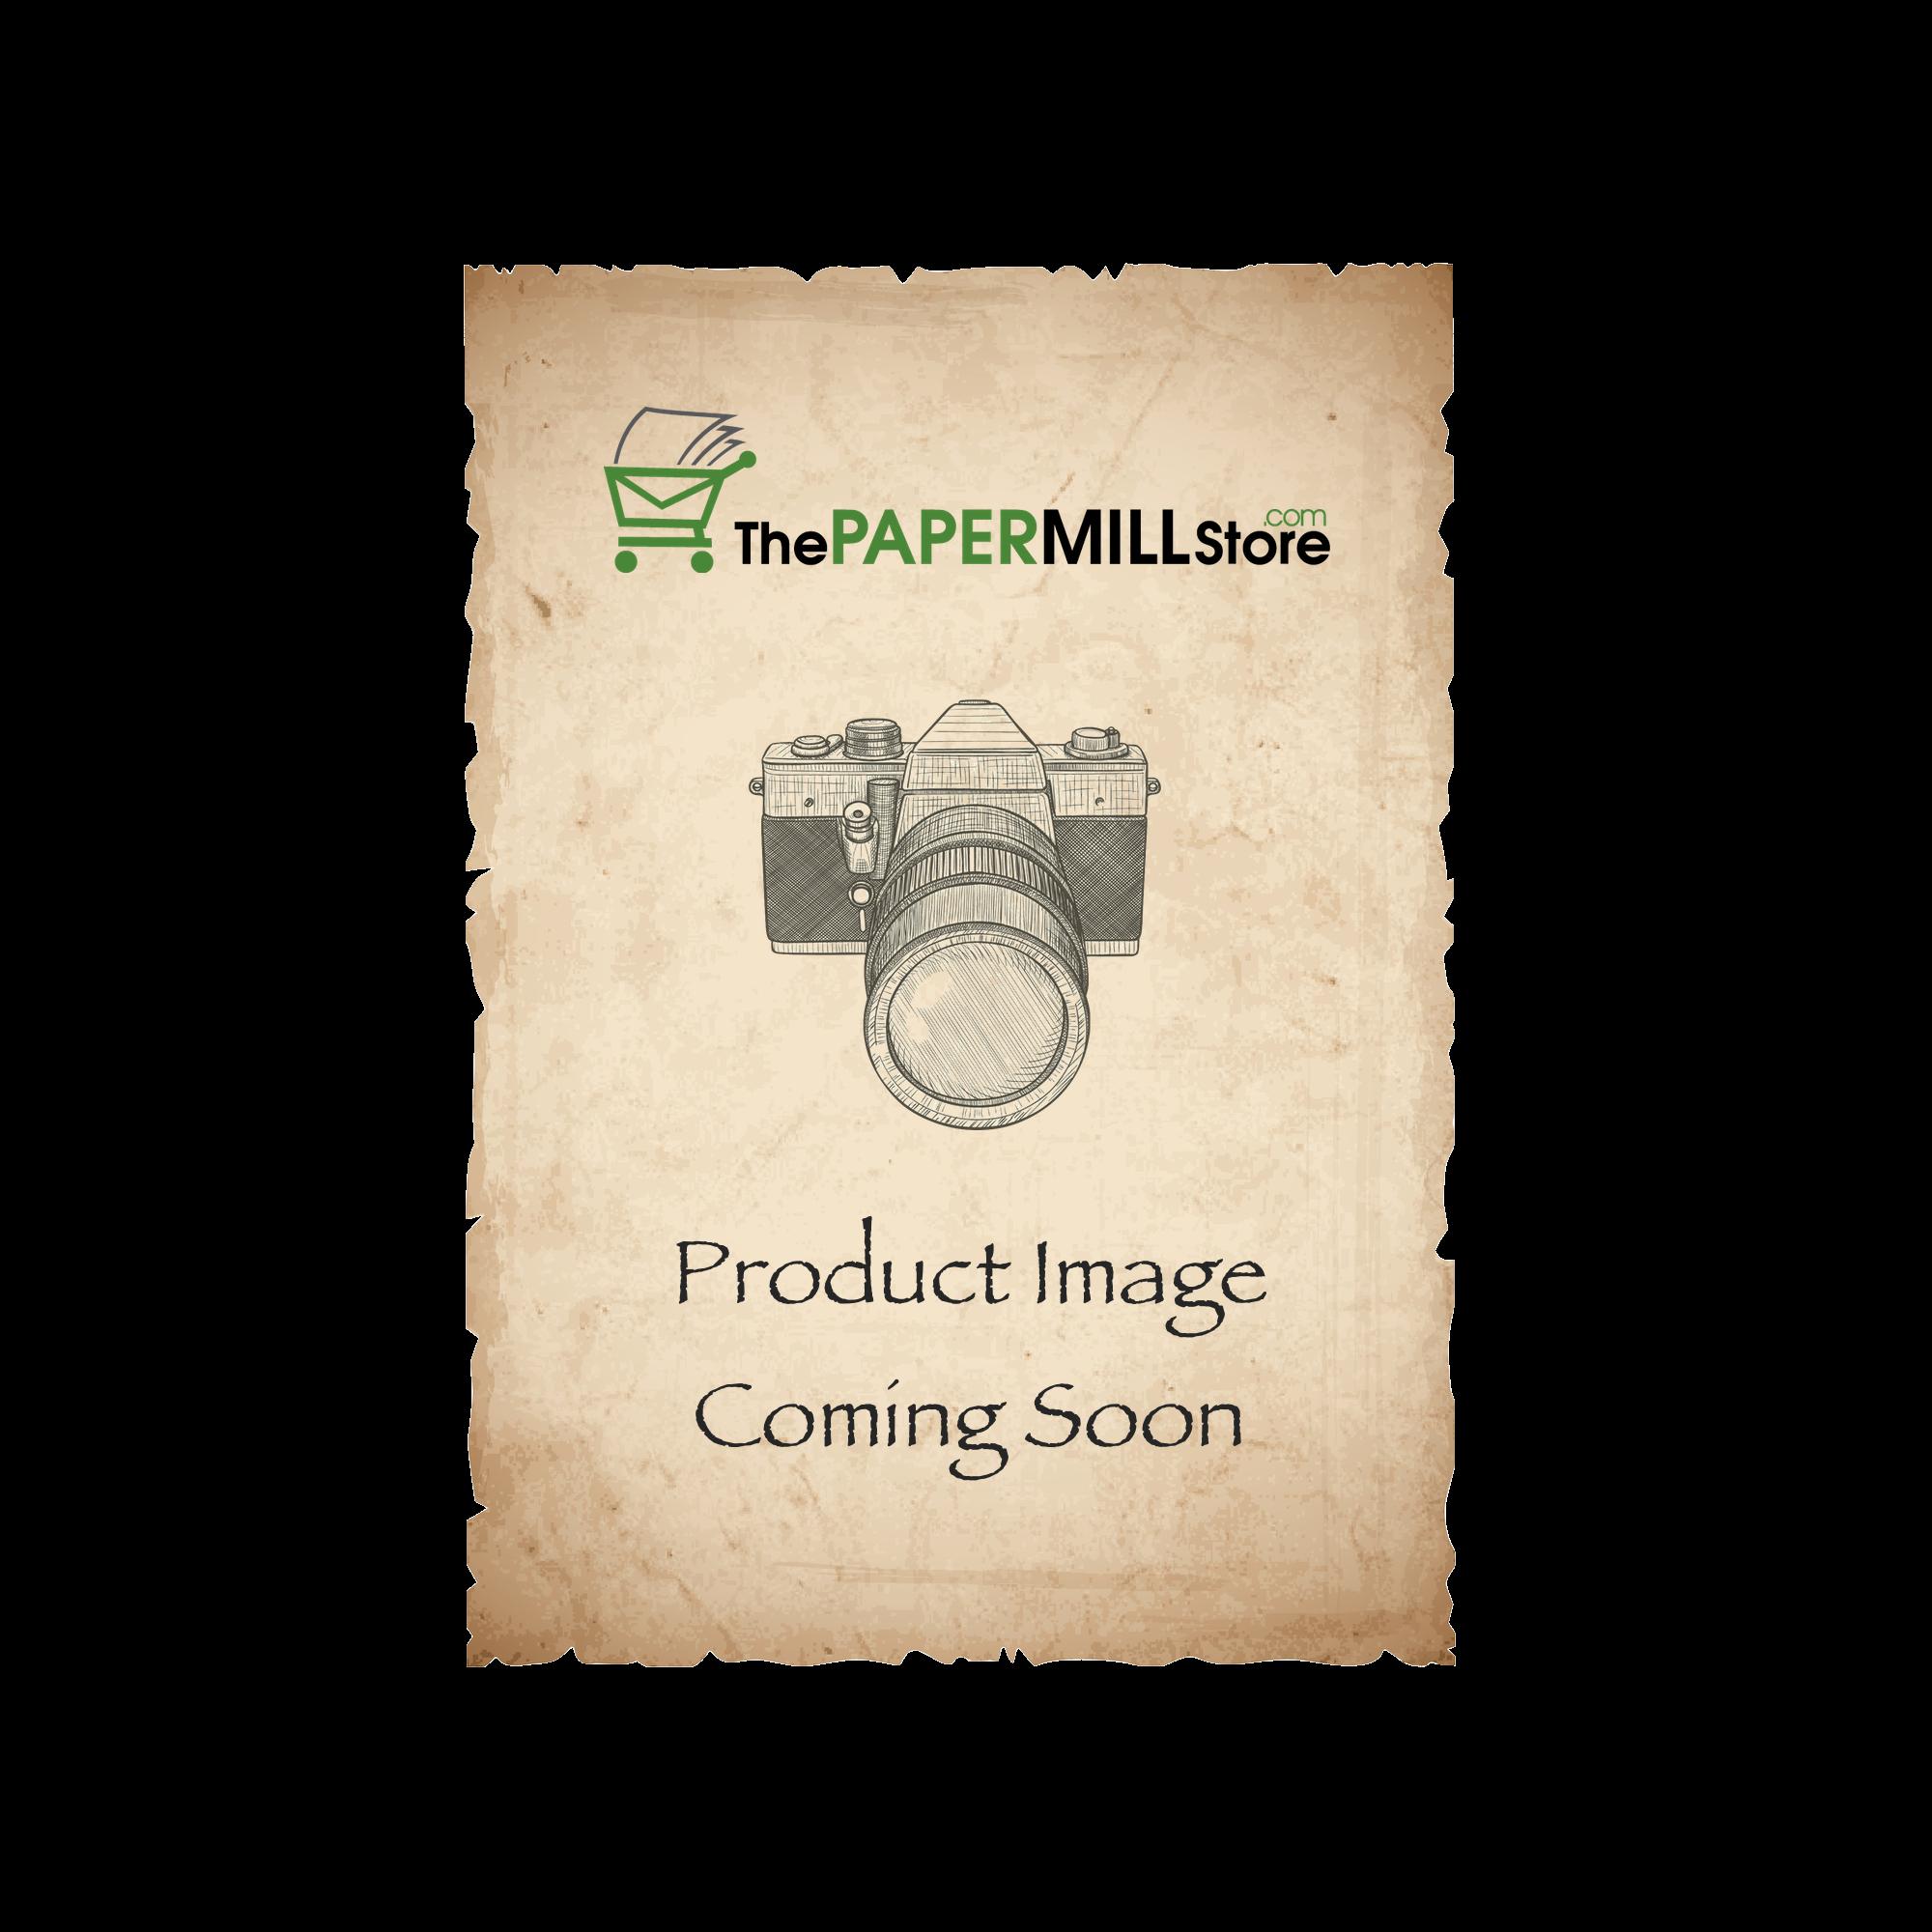 Printmaster Brown Kraft Envelopes - No. 3 Coin (2 1/2 x 4 1/4) 28 lb Writing 500 per Box